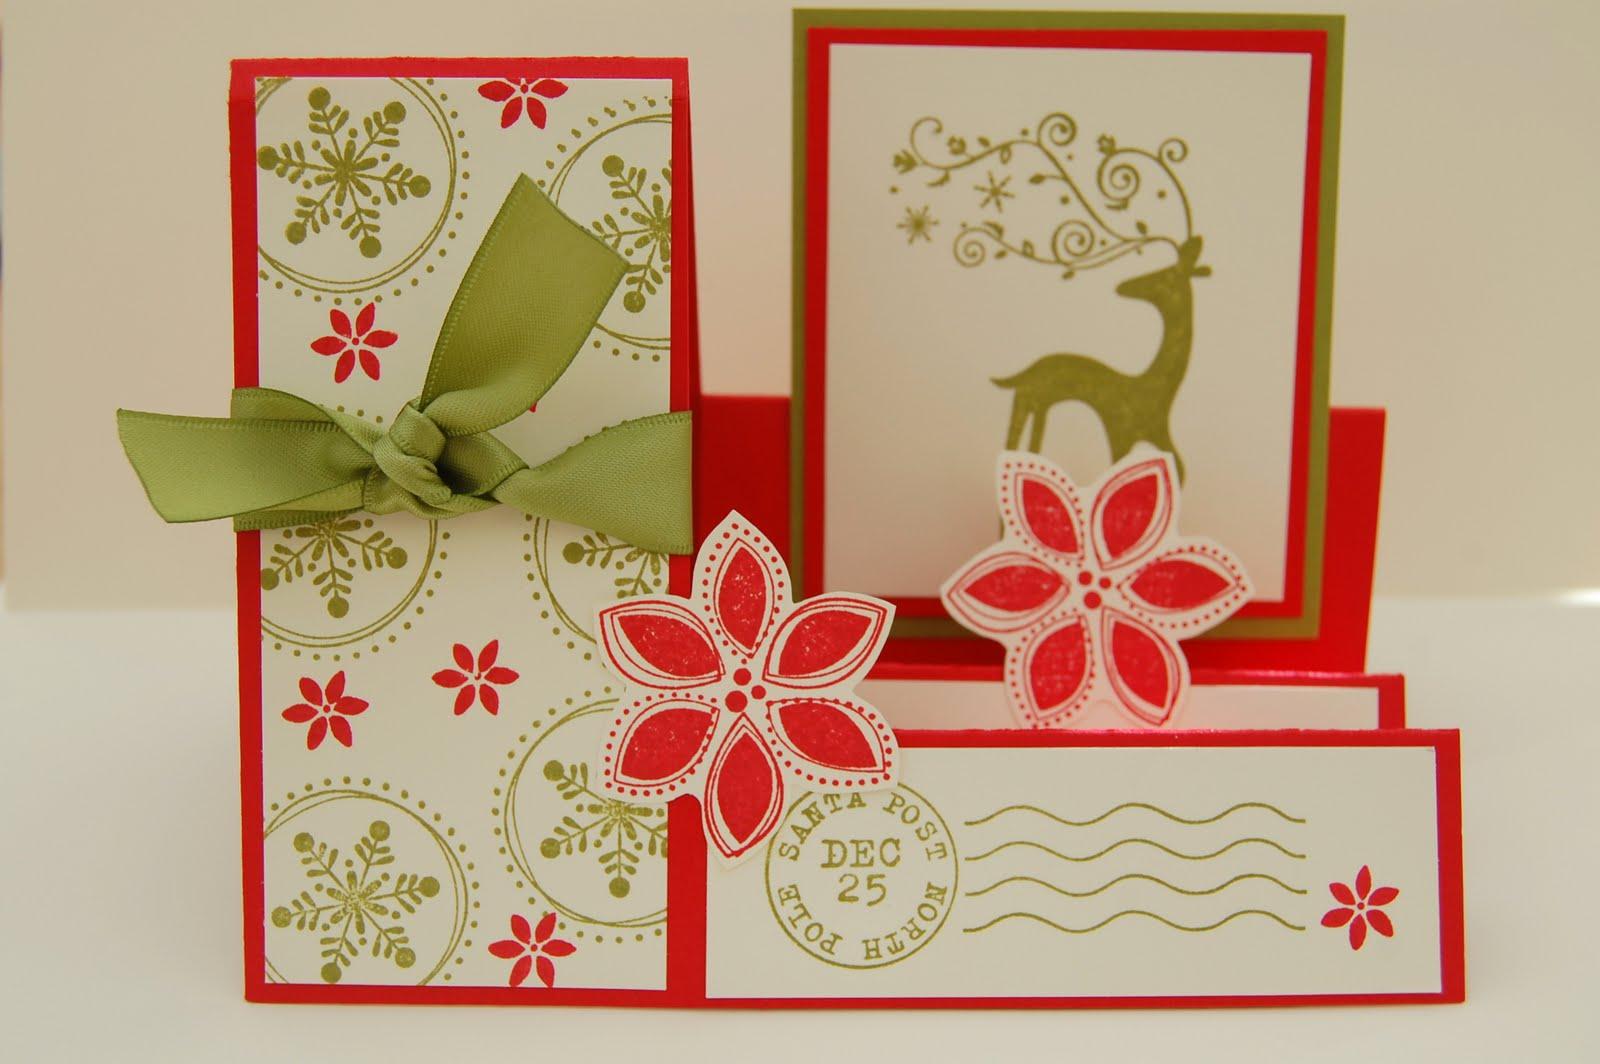 Permalink to christmas card ideas 2016